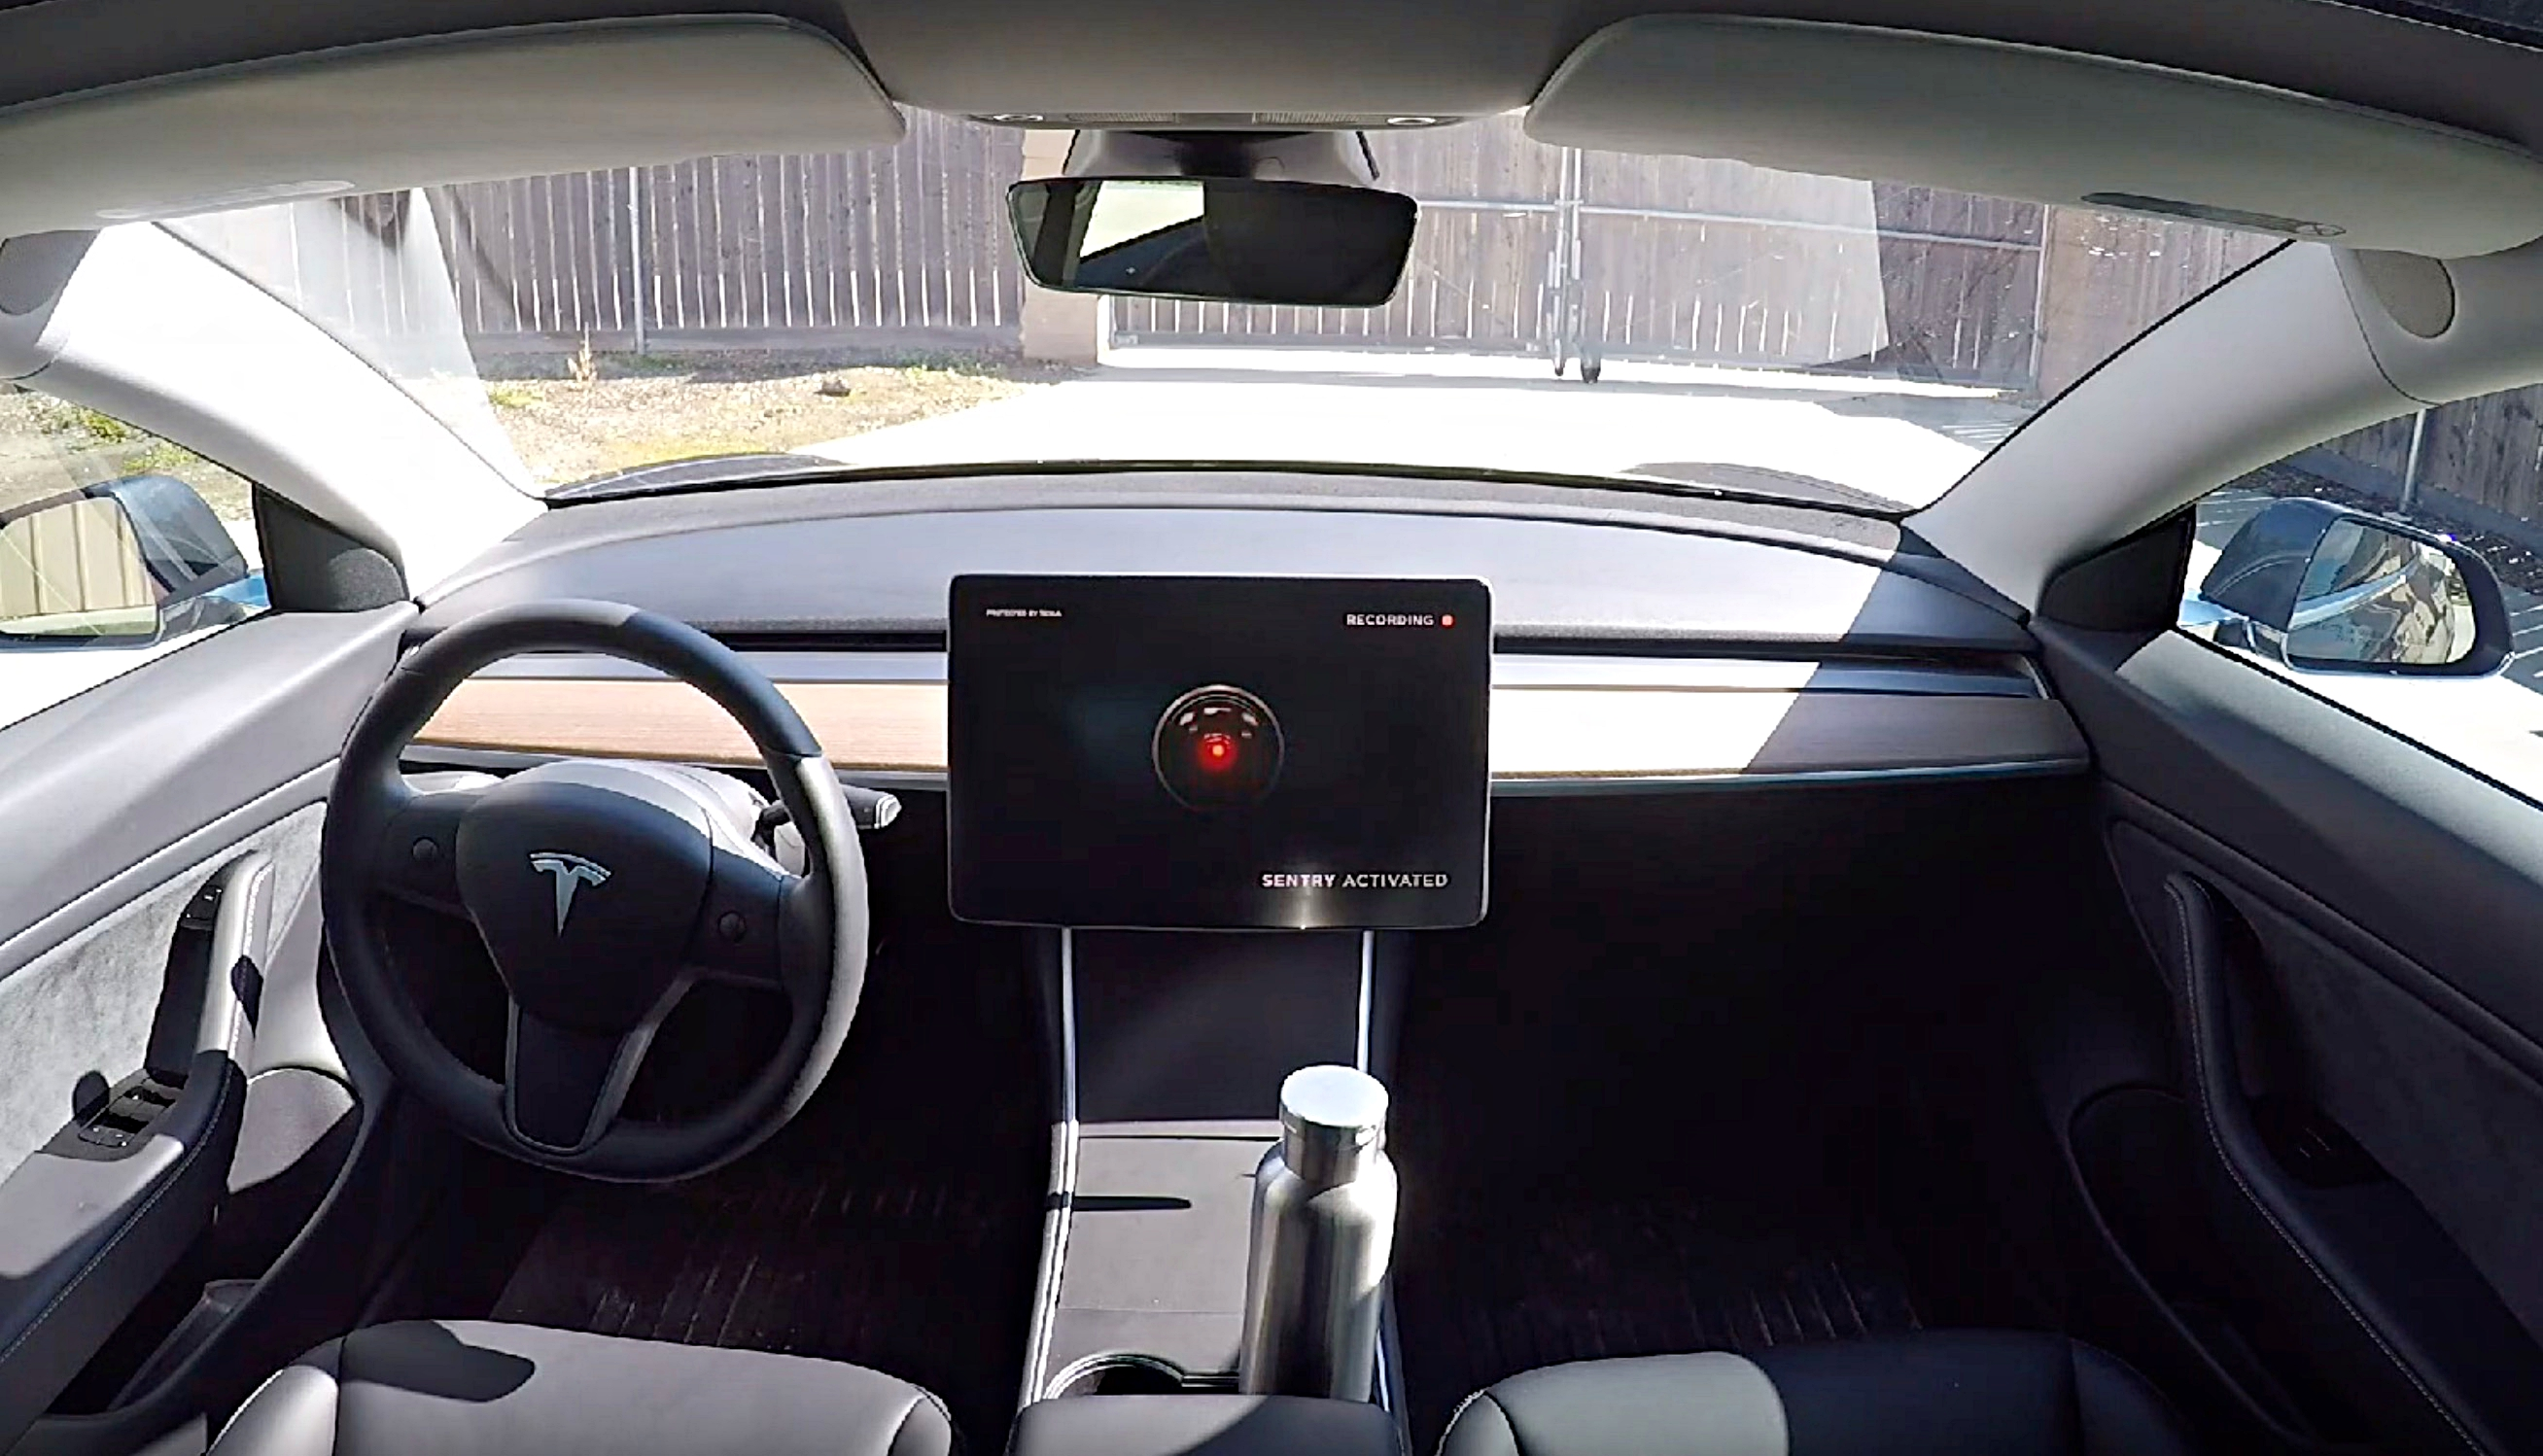 tesla-sentry-mode-model-3-touchscreen